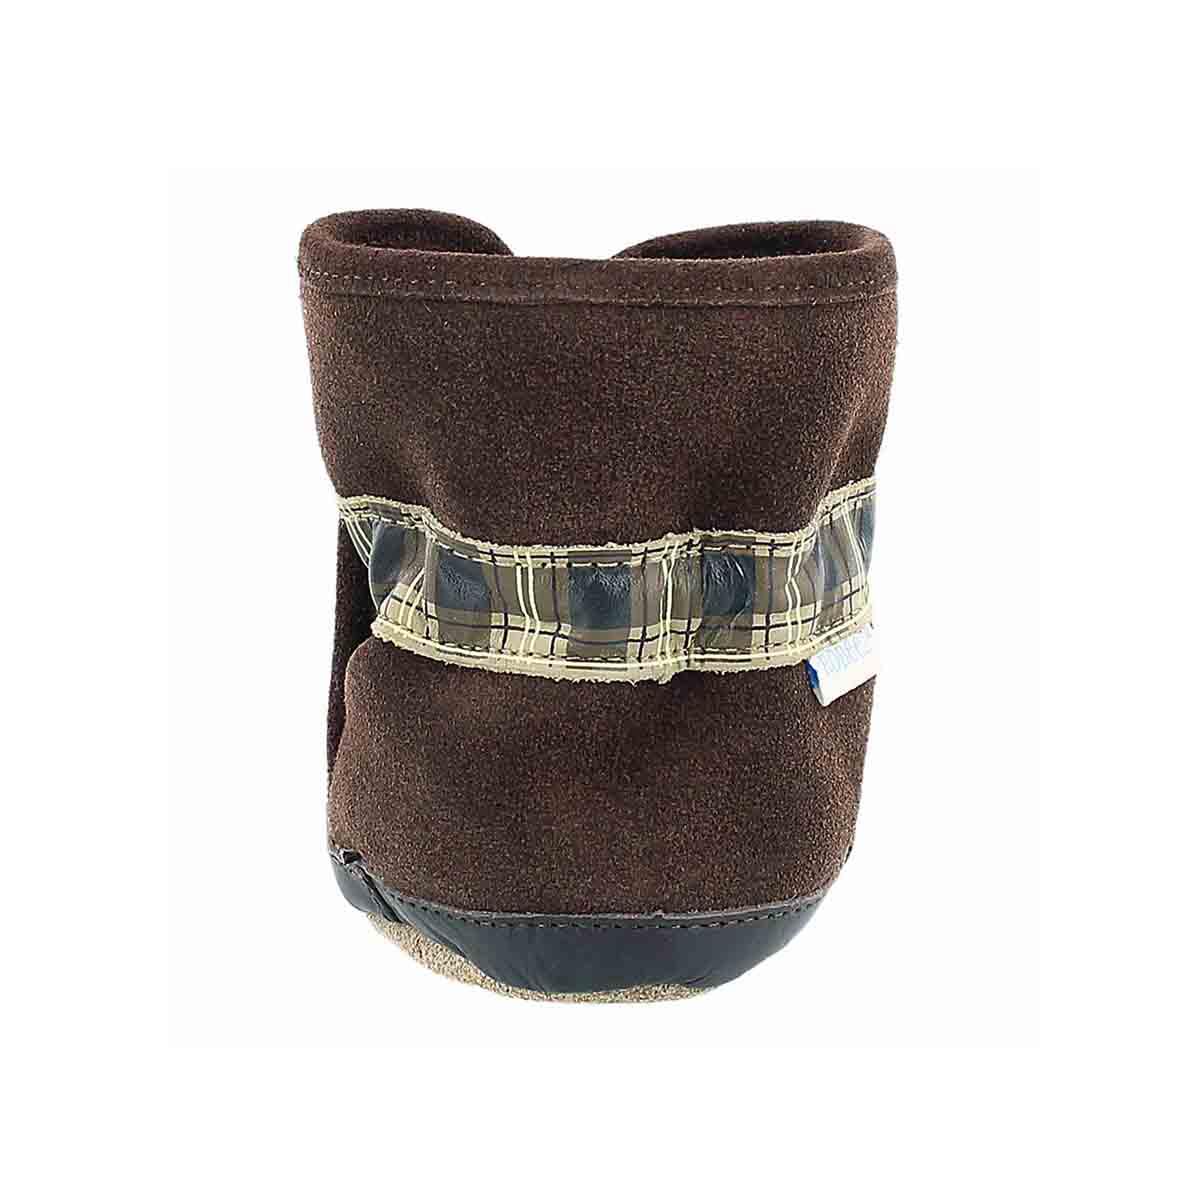 Inf CozyAnkleBootie brn softsole slipper